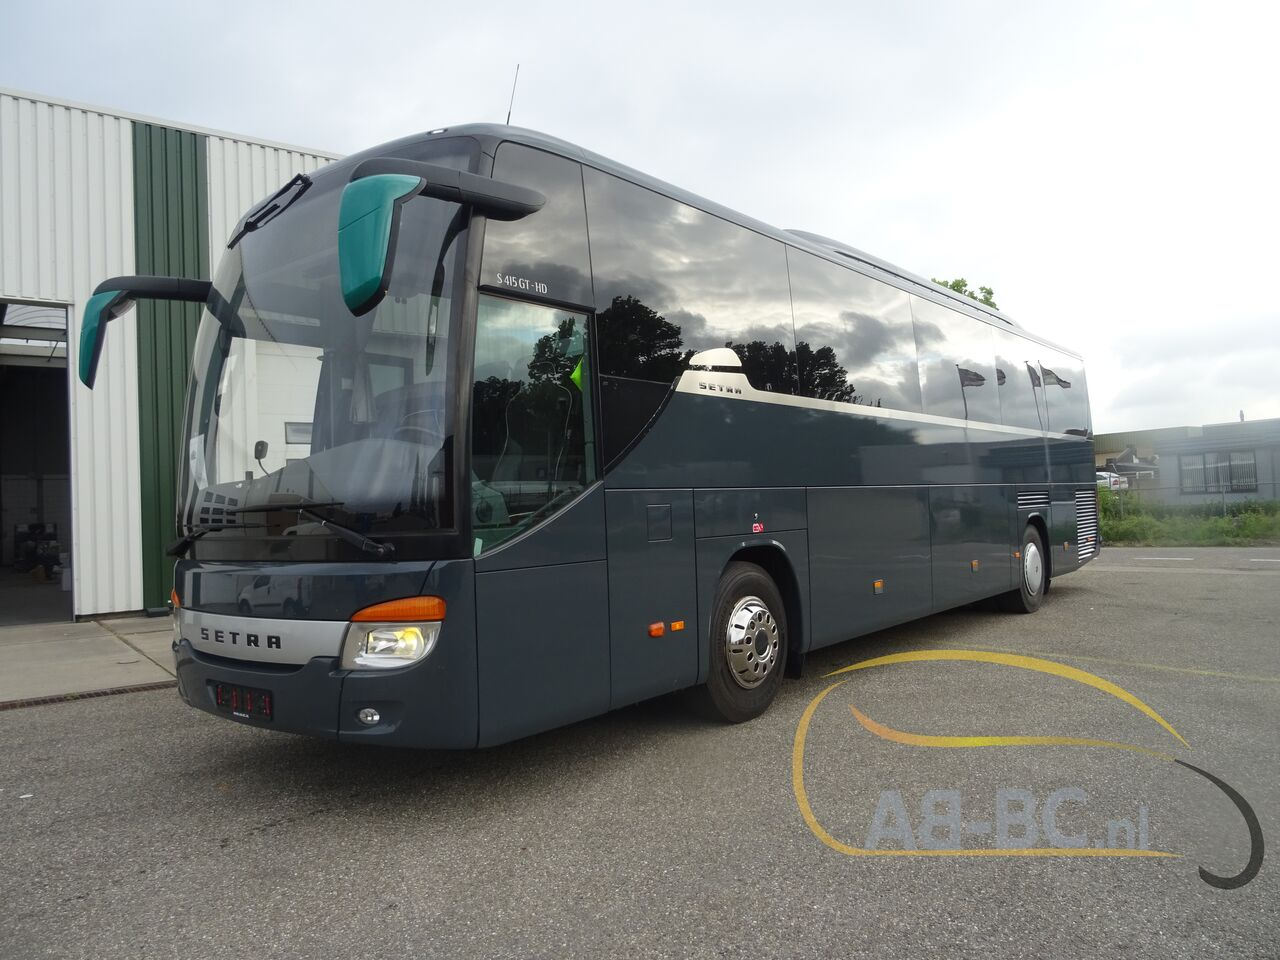 coach-busSETRA-S415-GT-HD-FINAL-EDITION---1627456984750884638_big_e50694671c448ee022306c84f30102fb--21050713010665719300